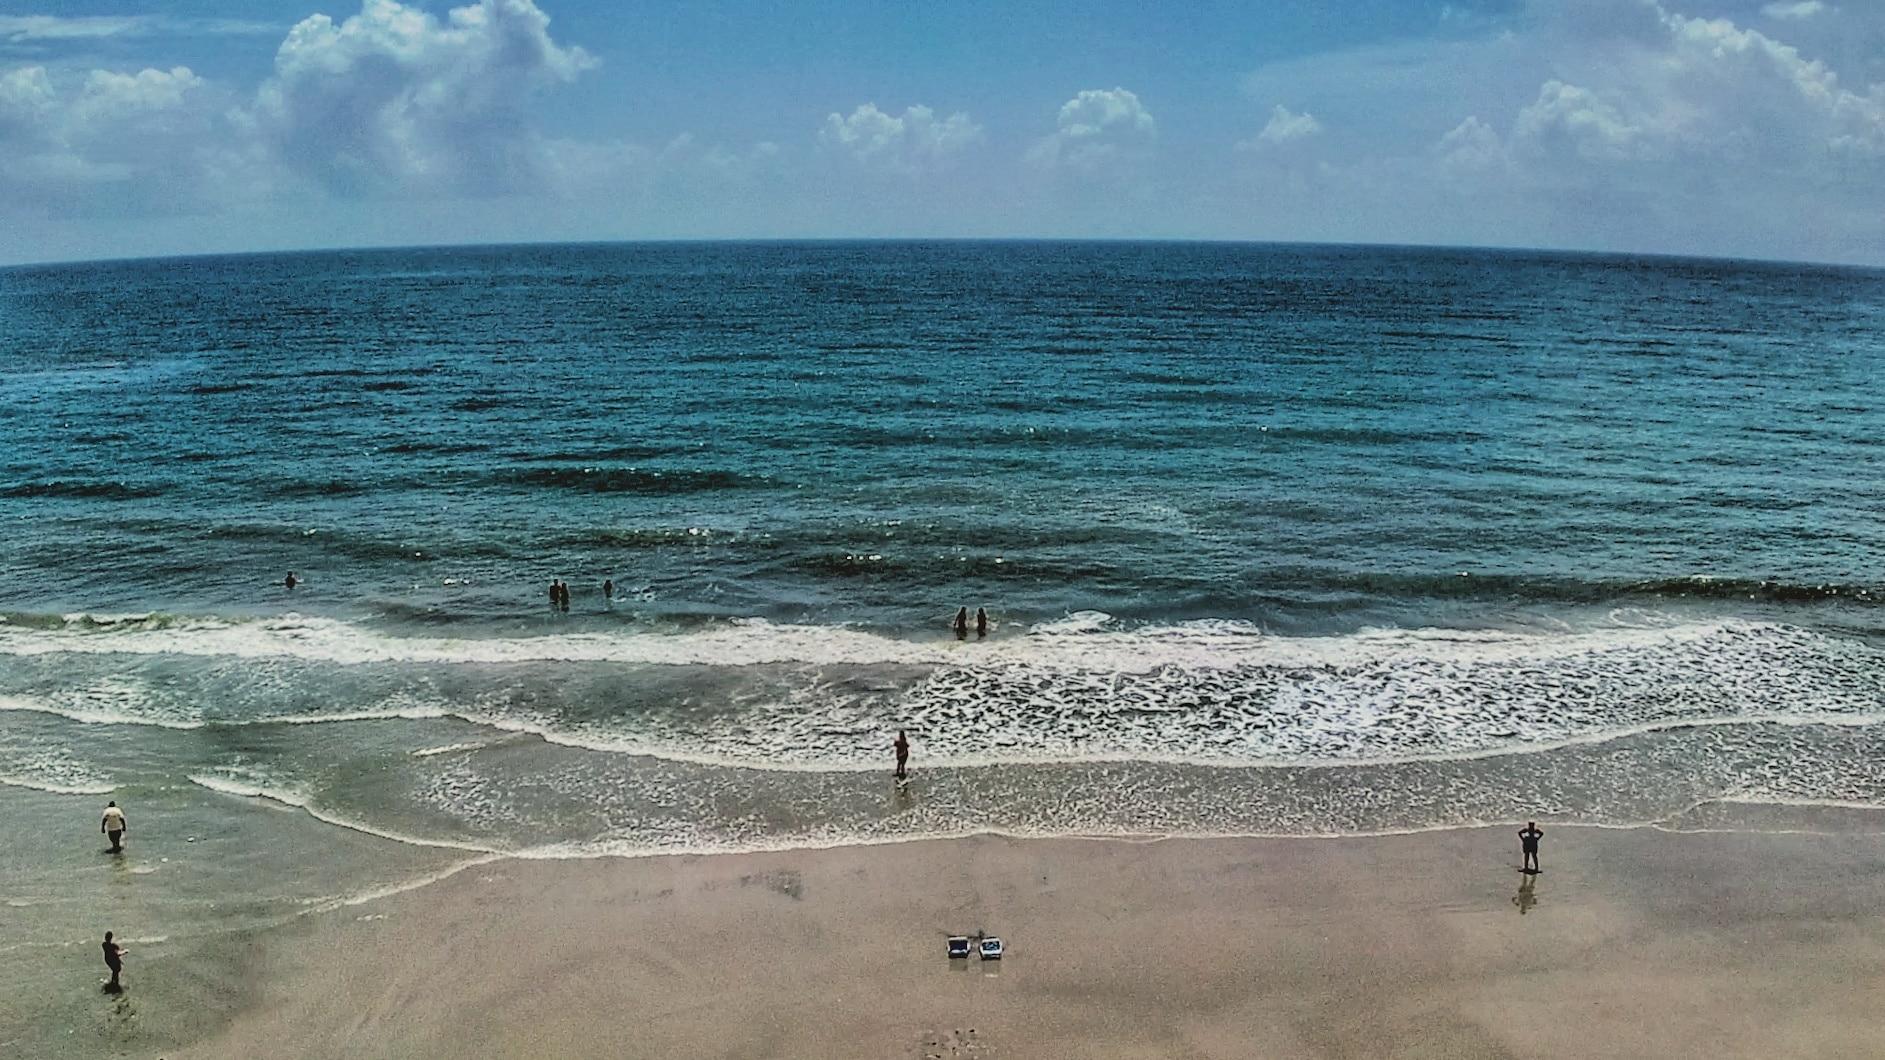 Dunes Village, Myrtle Beach, South Carolina, United States of America